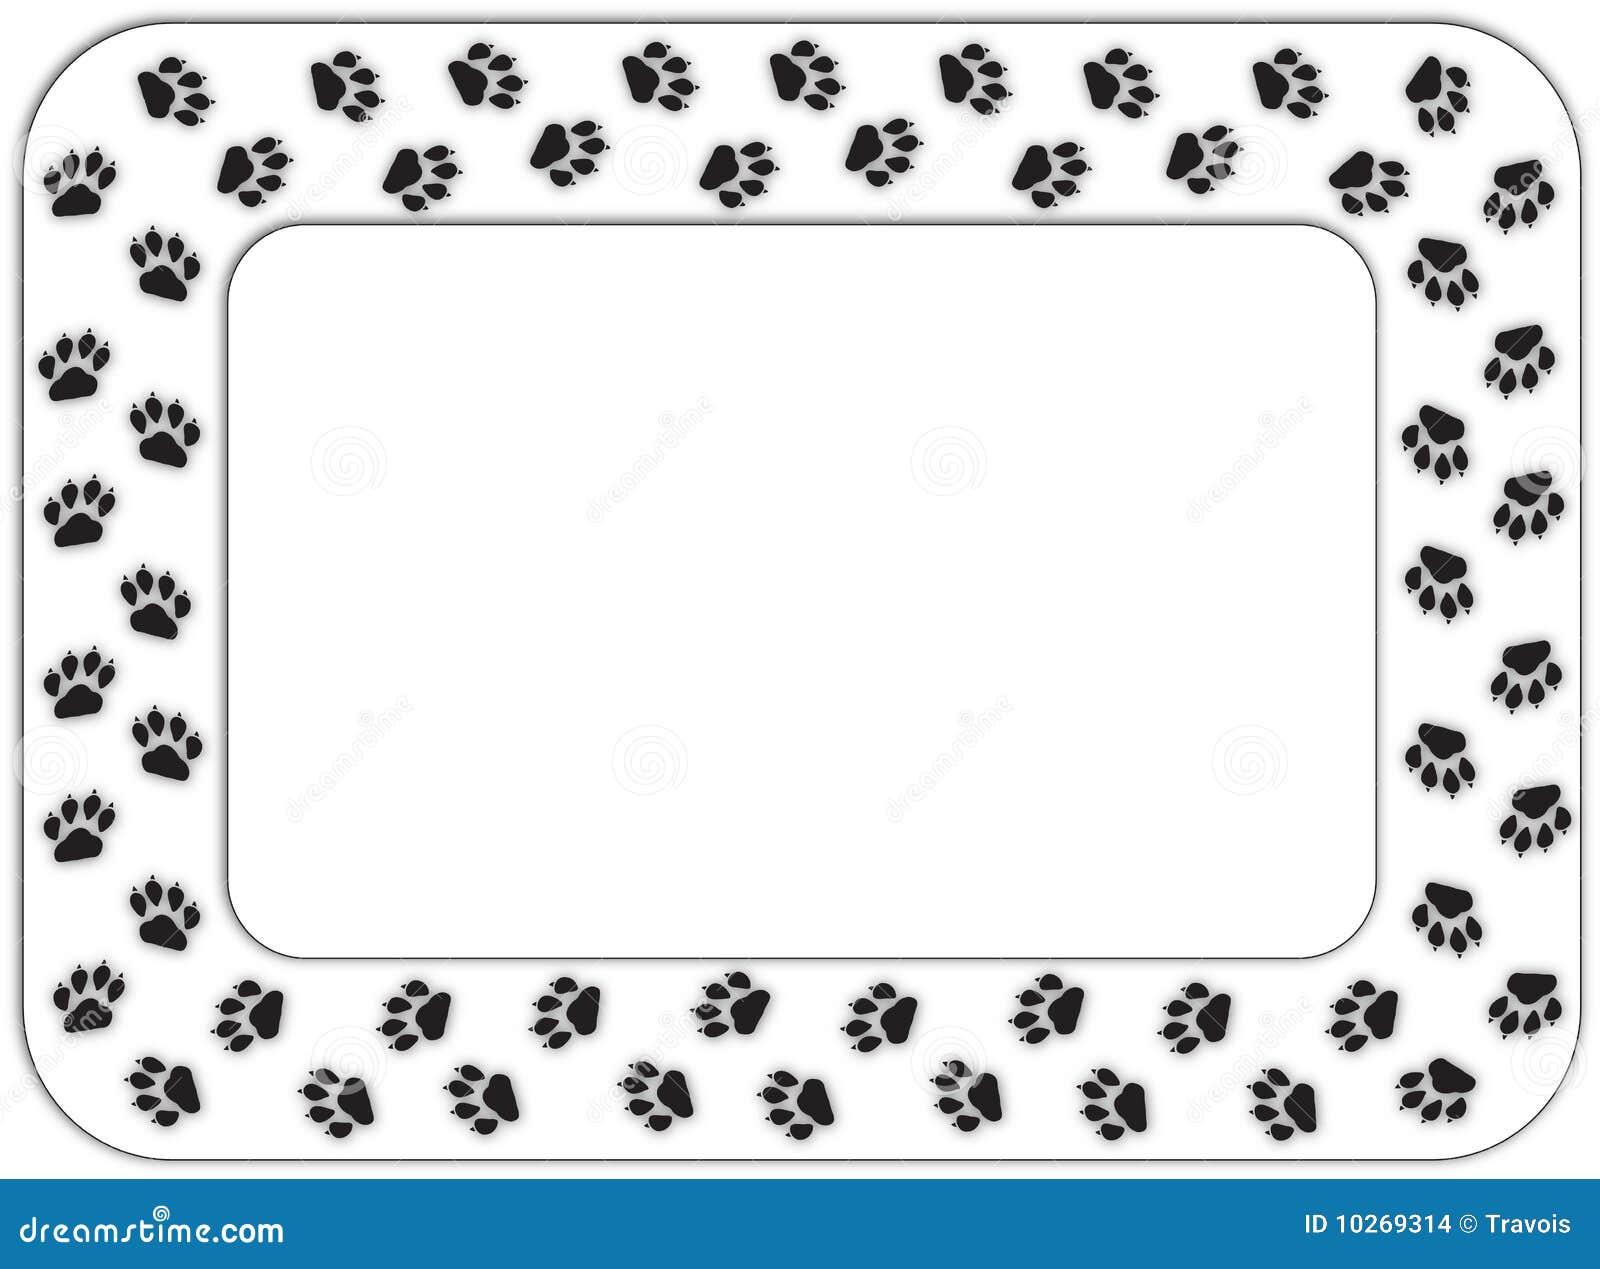 Paw print frame stock illustration. Illustration of black - 10269314